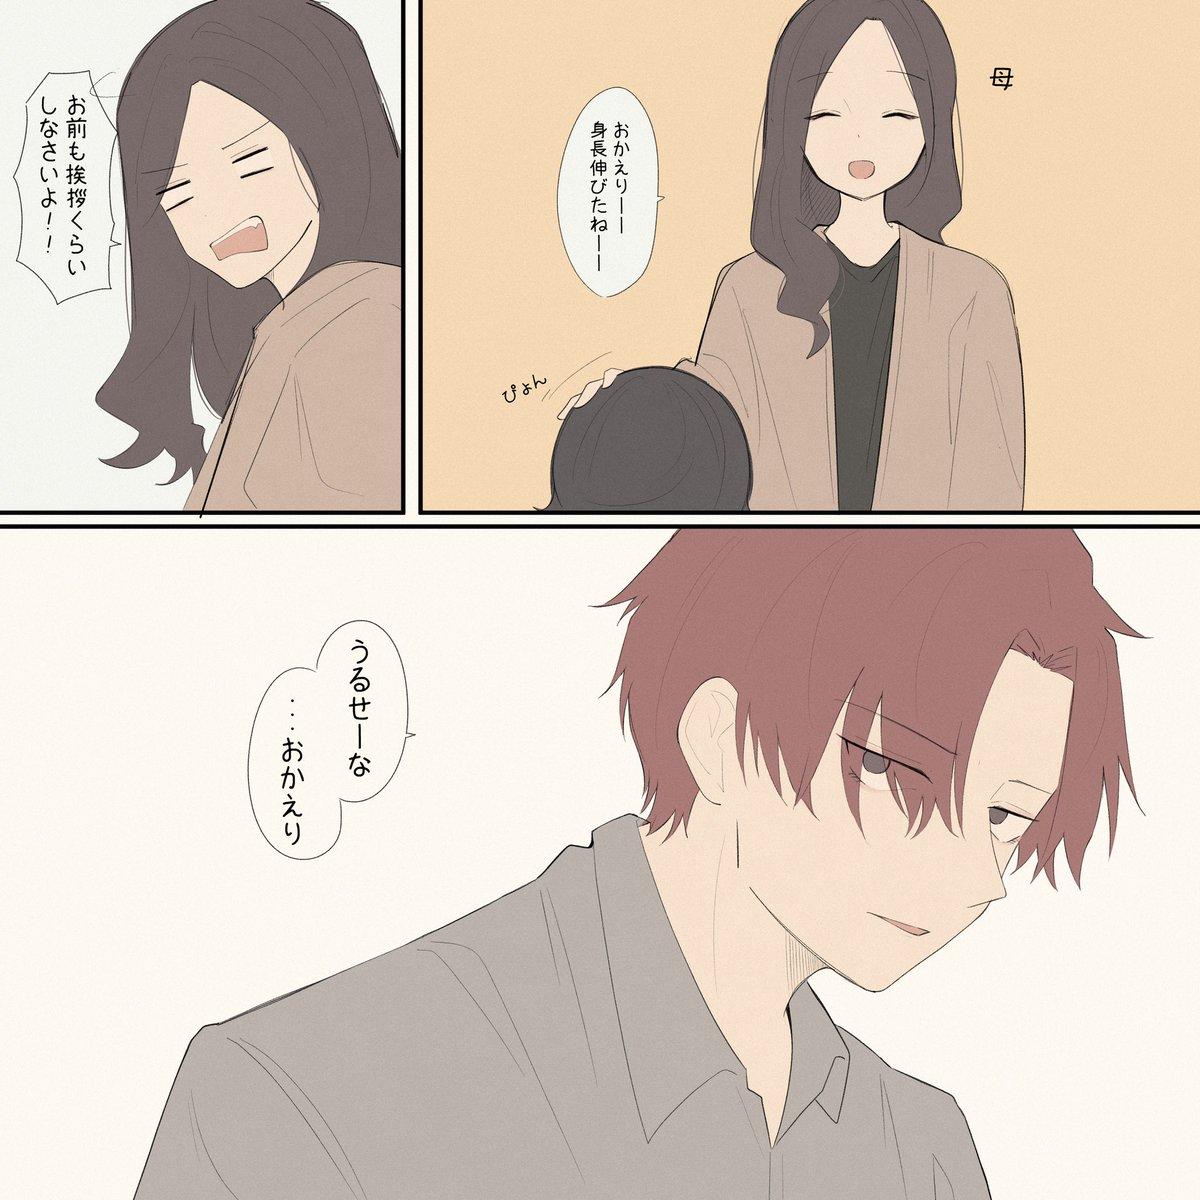 UZNo/9月〜のお仕事募集中さんの投稿画像